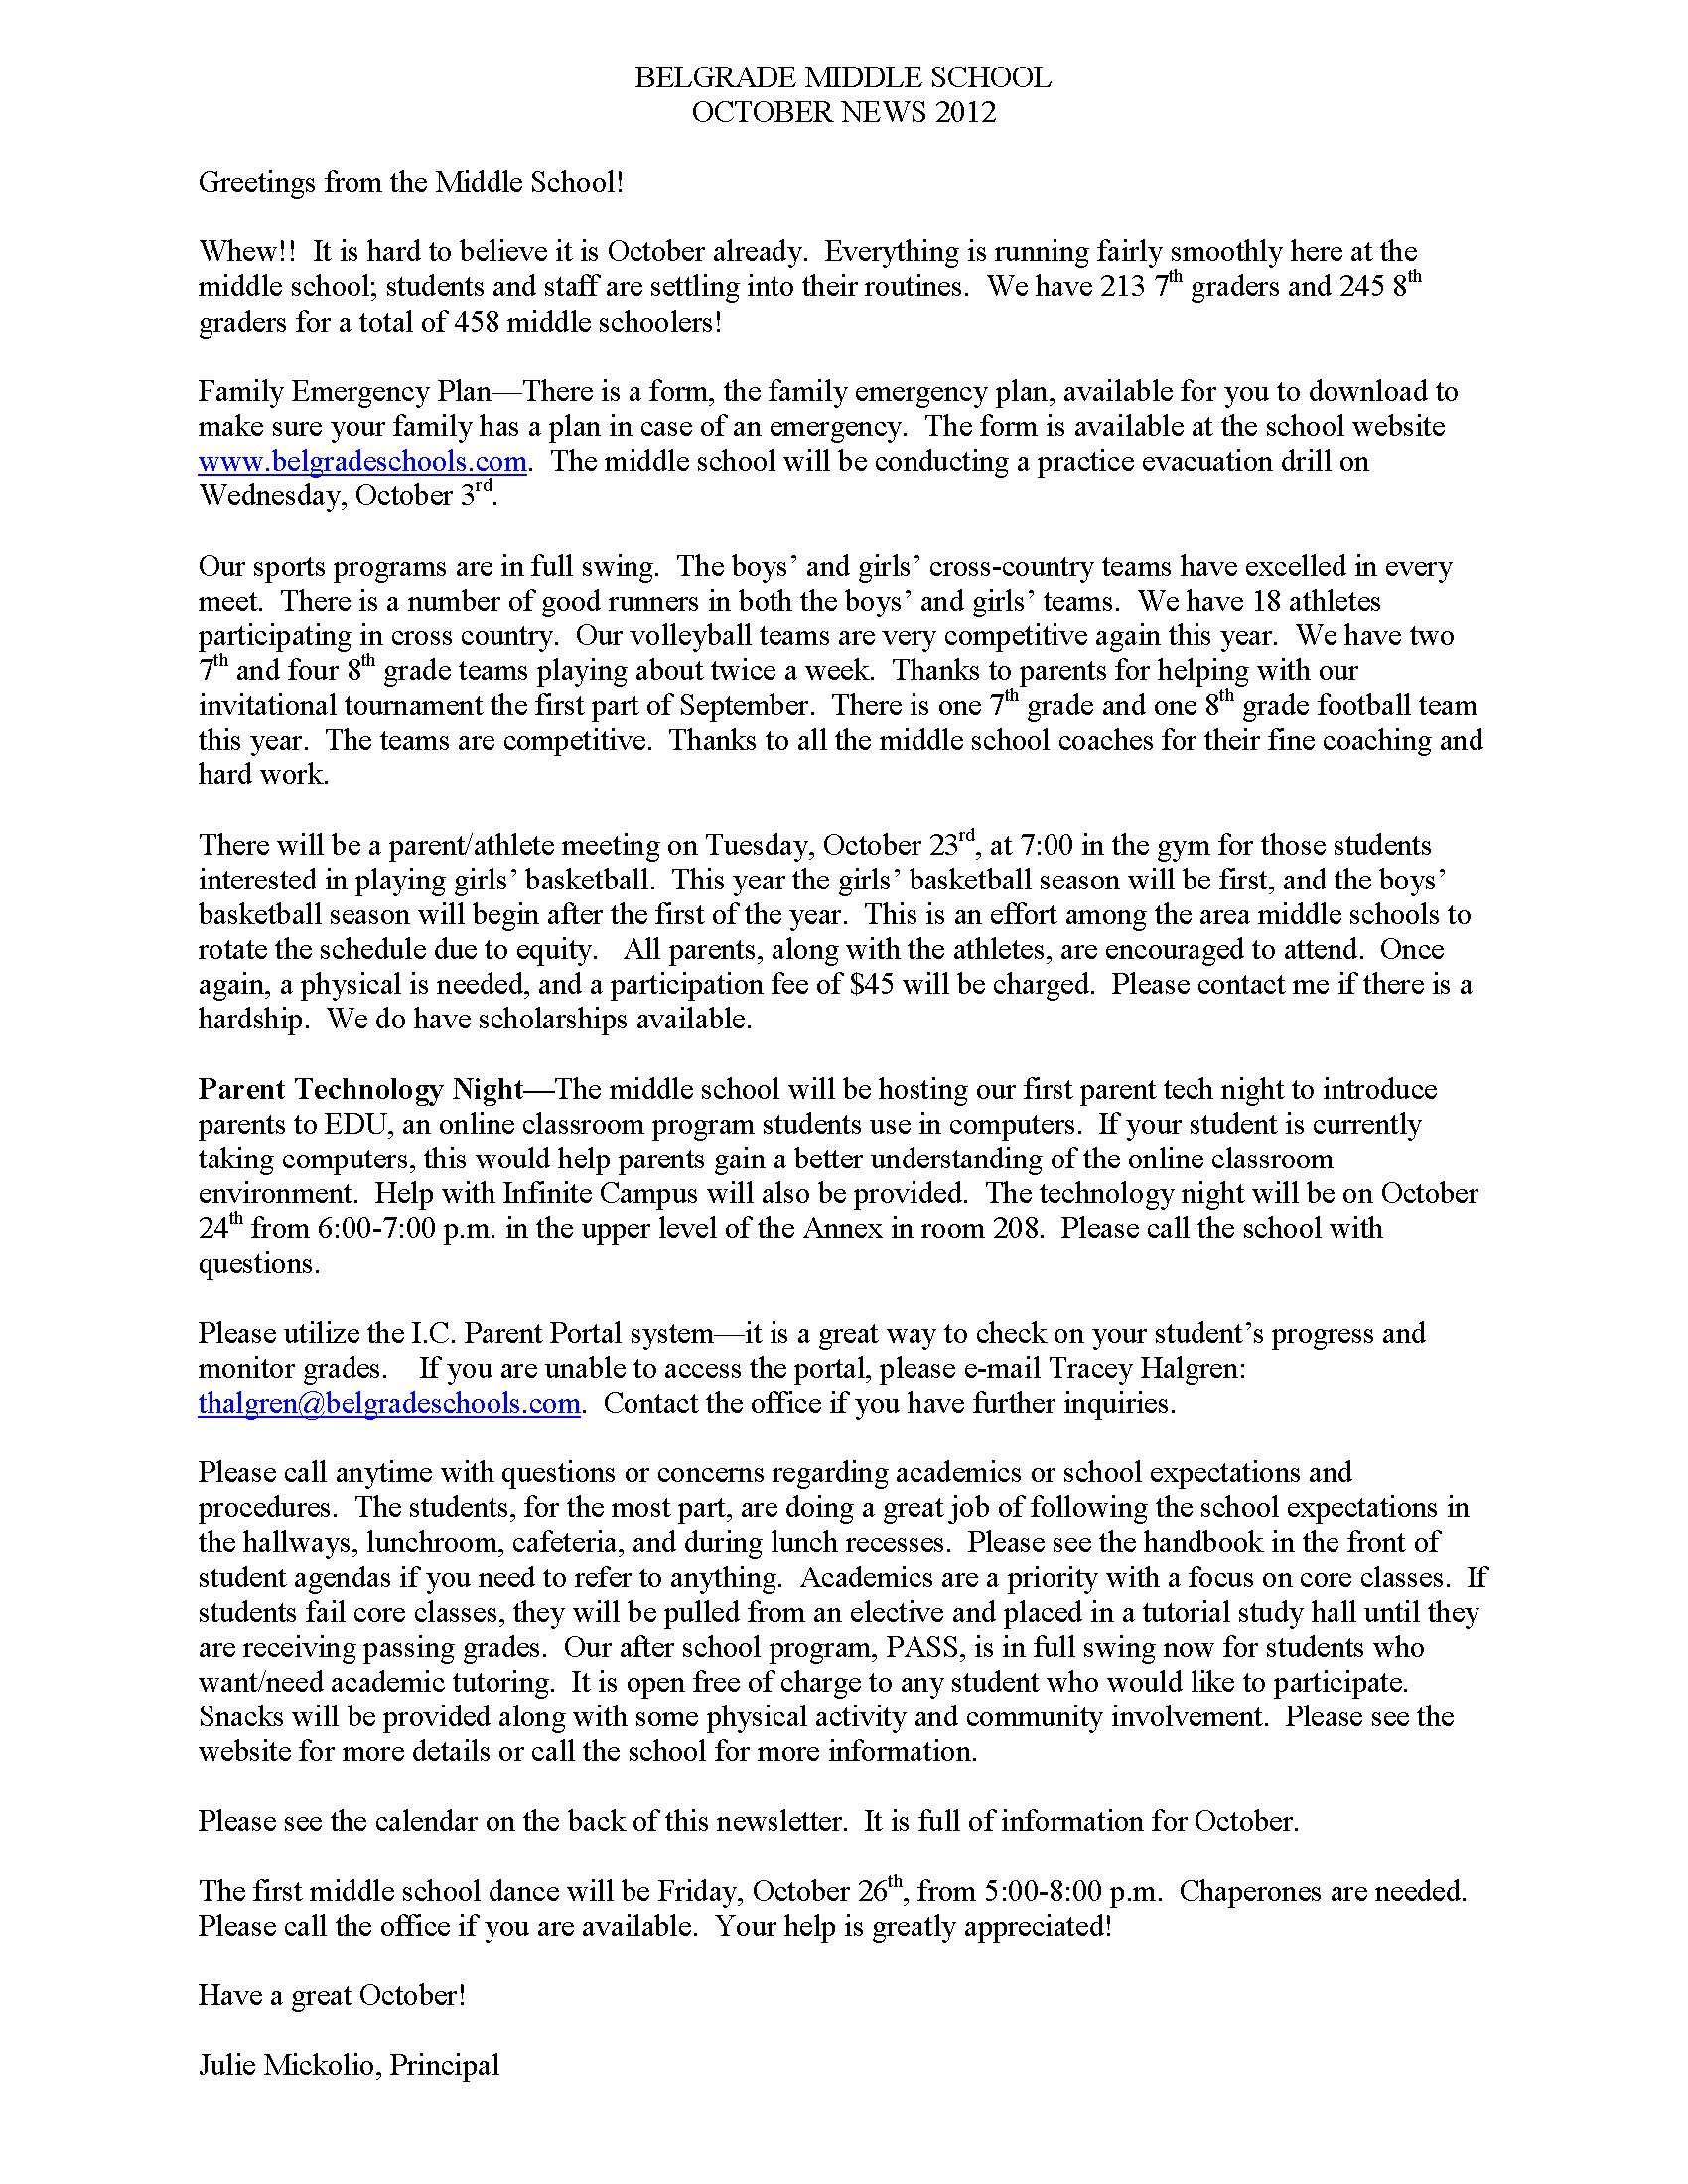 Middle School October Newsletter